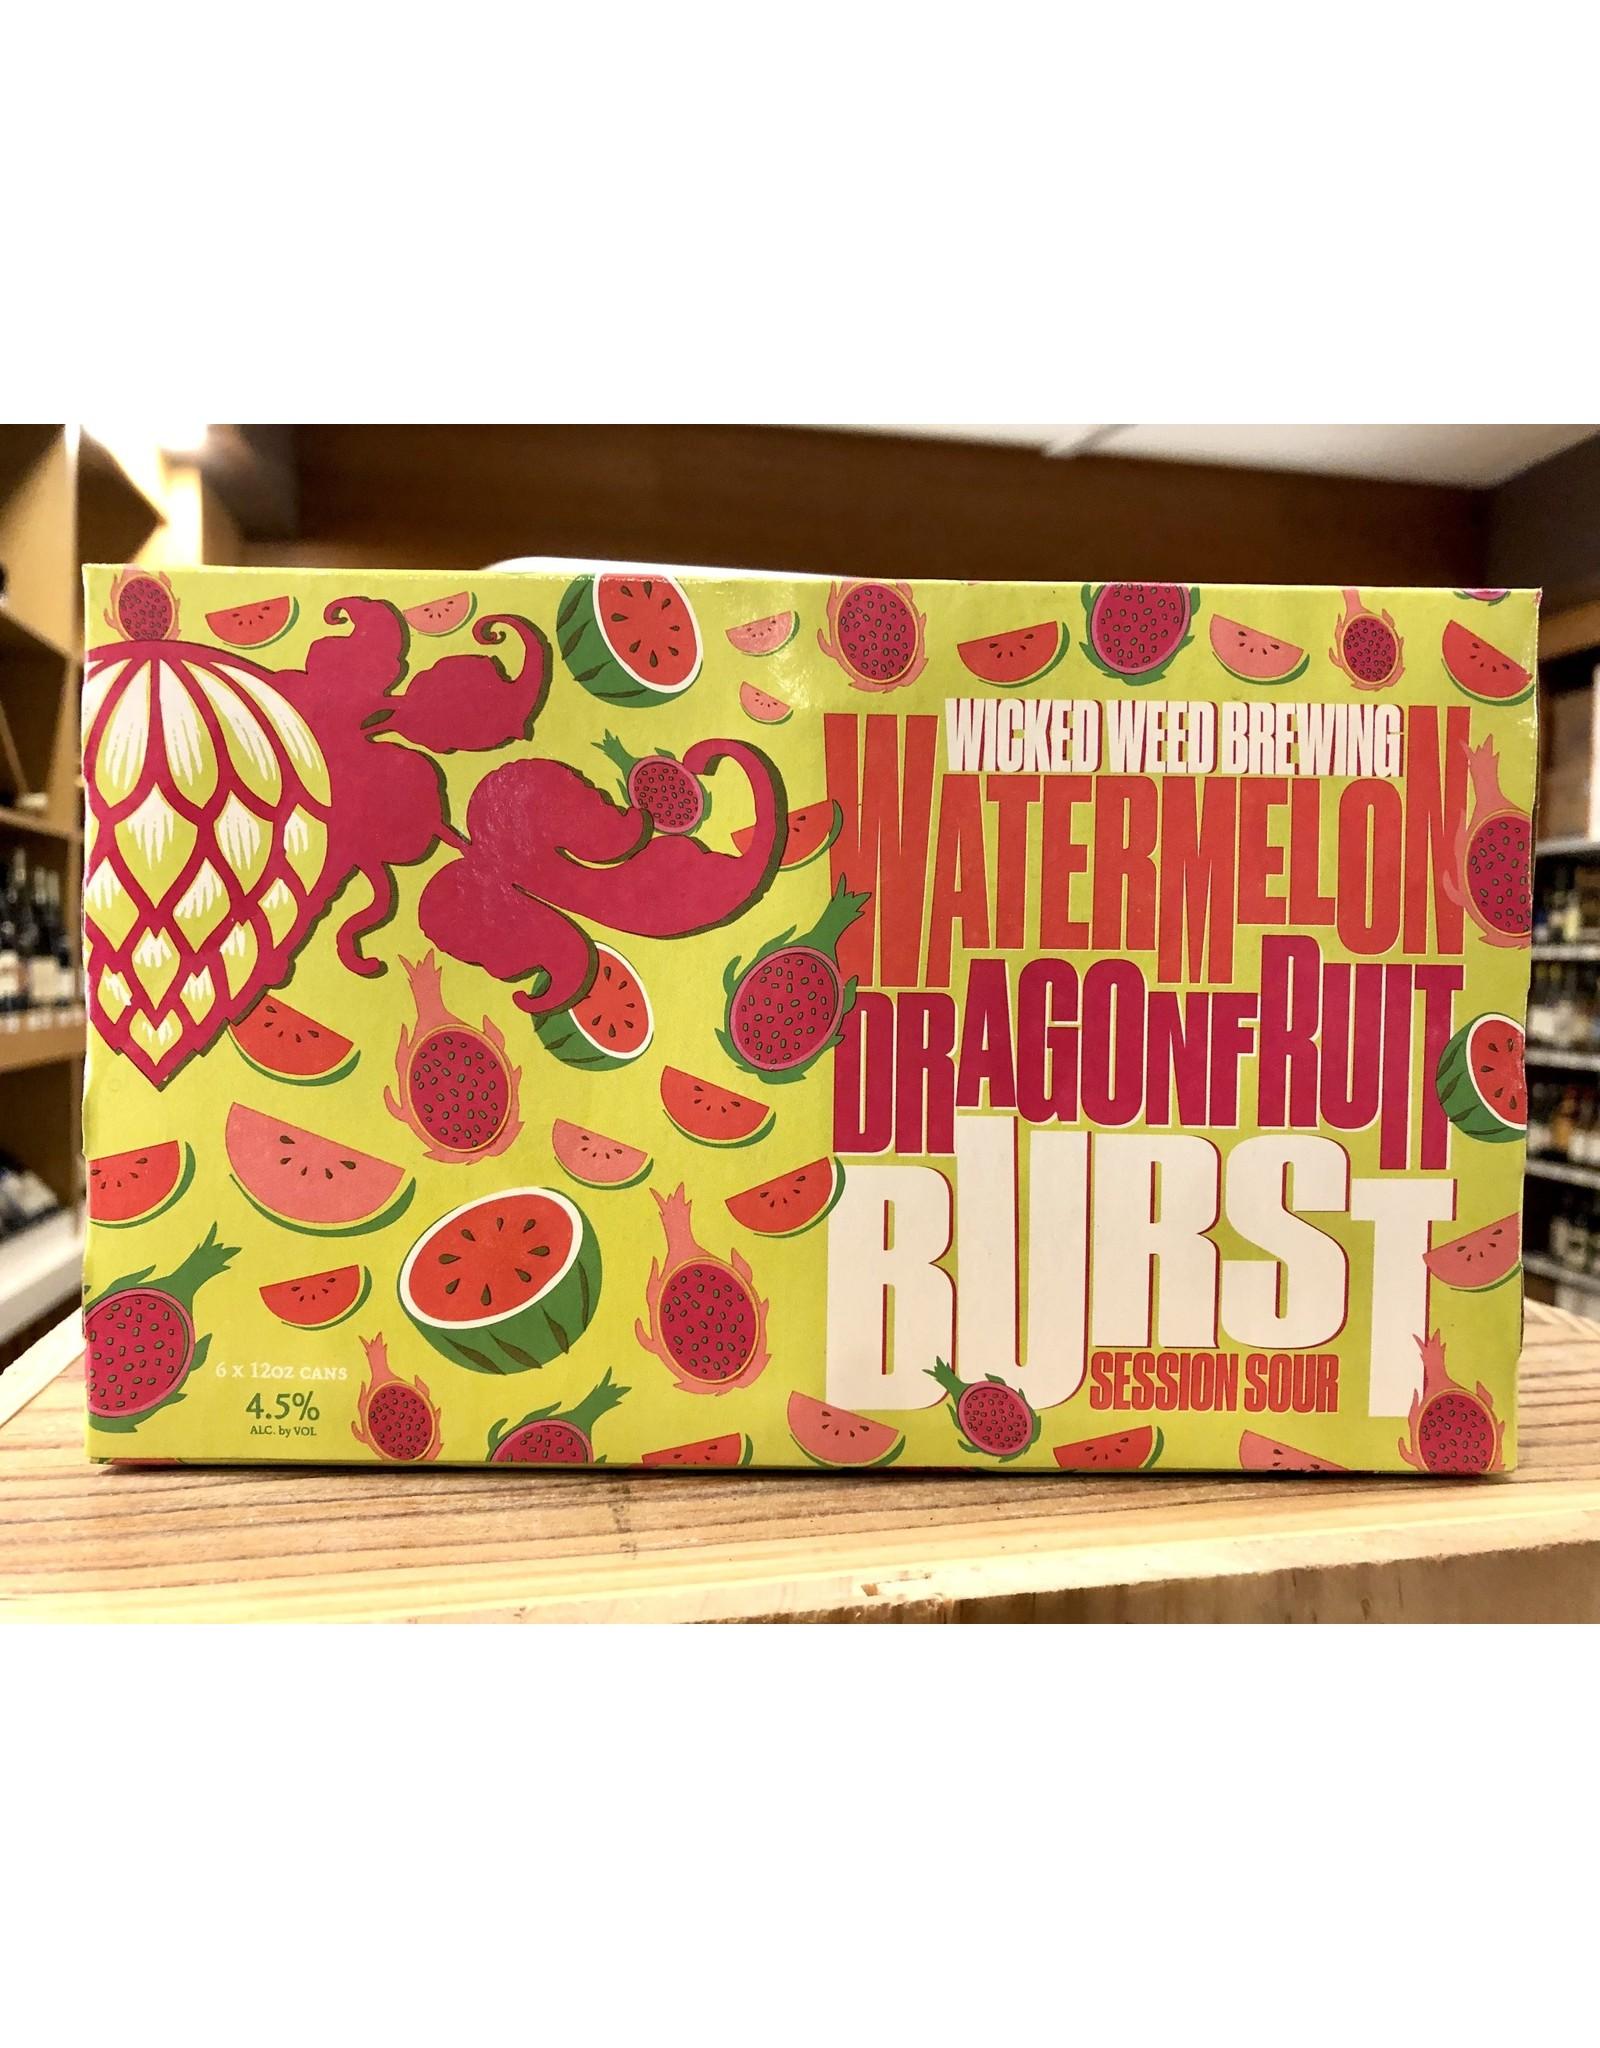 Wicked Weed Watermelon Dragonfruit Burst Sour - 6x12 oz.